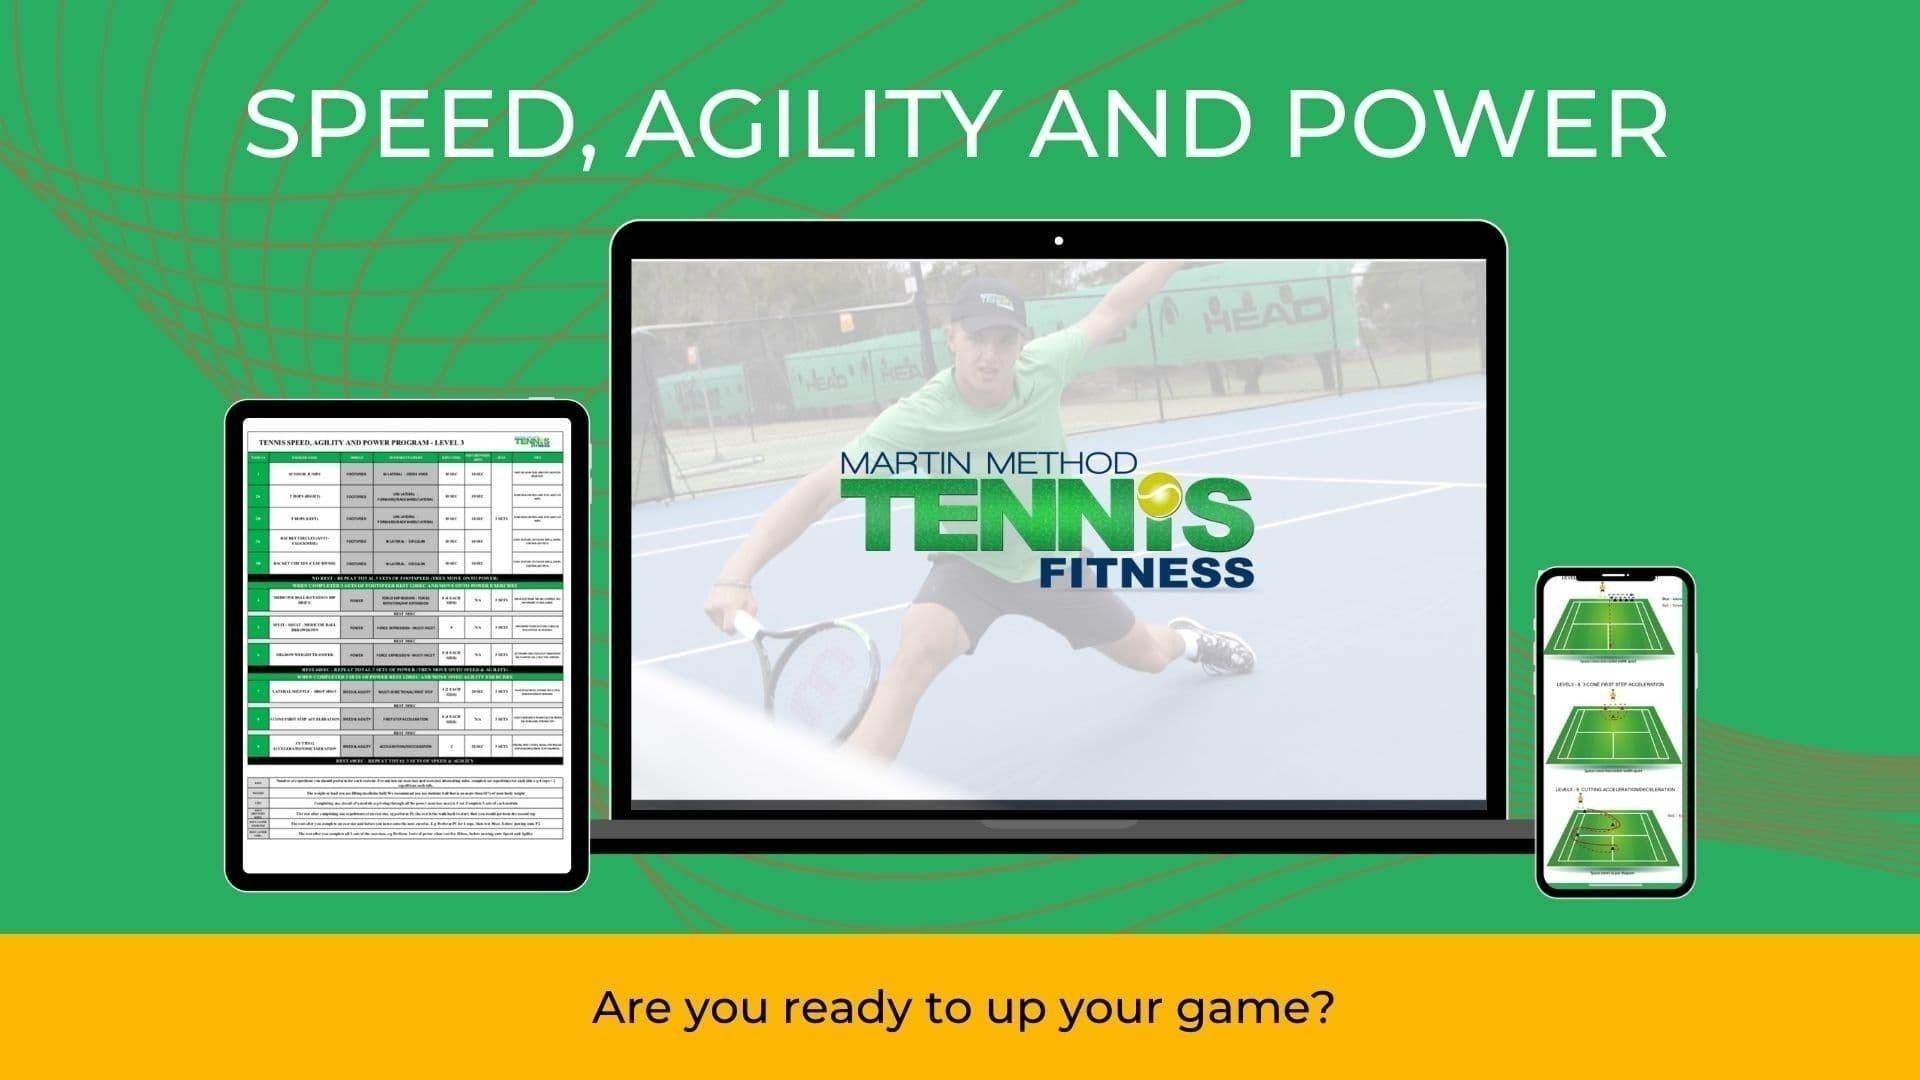 tennis-speed-agility-power-program-2